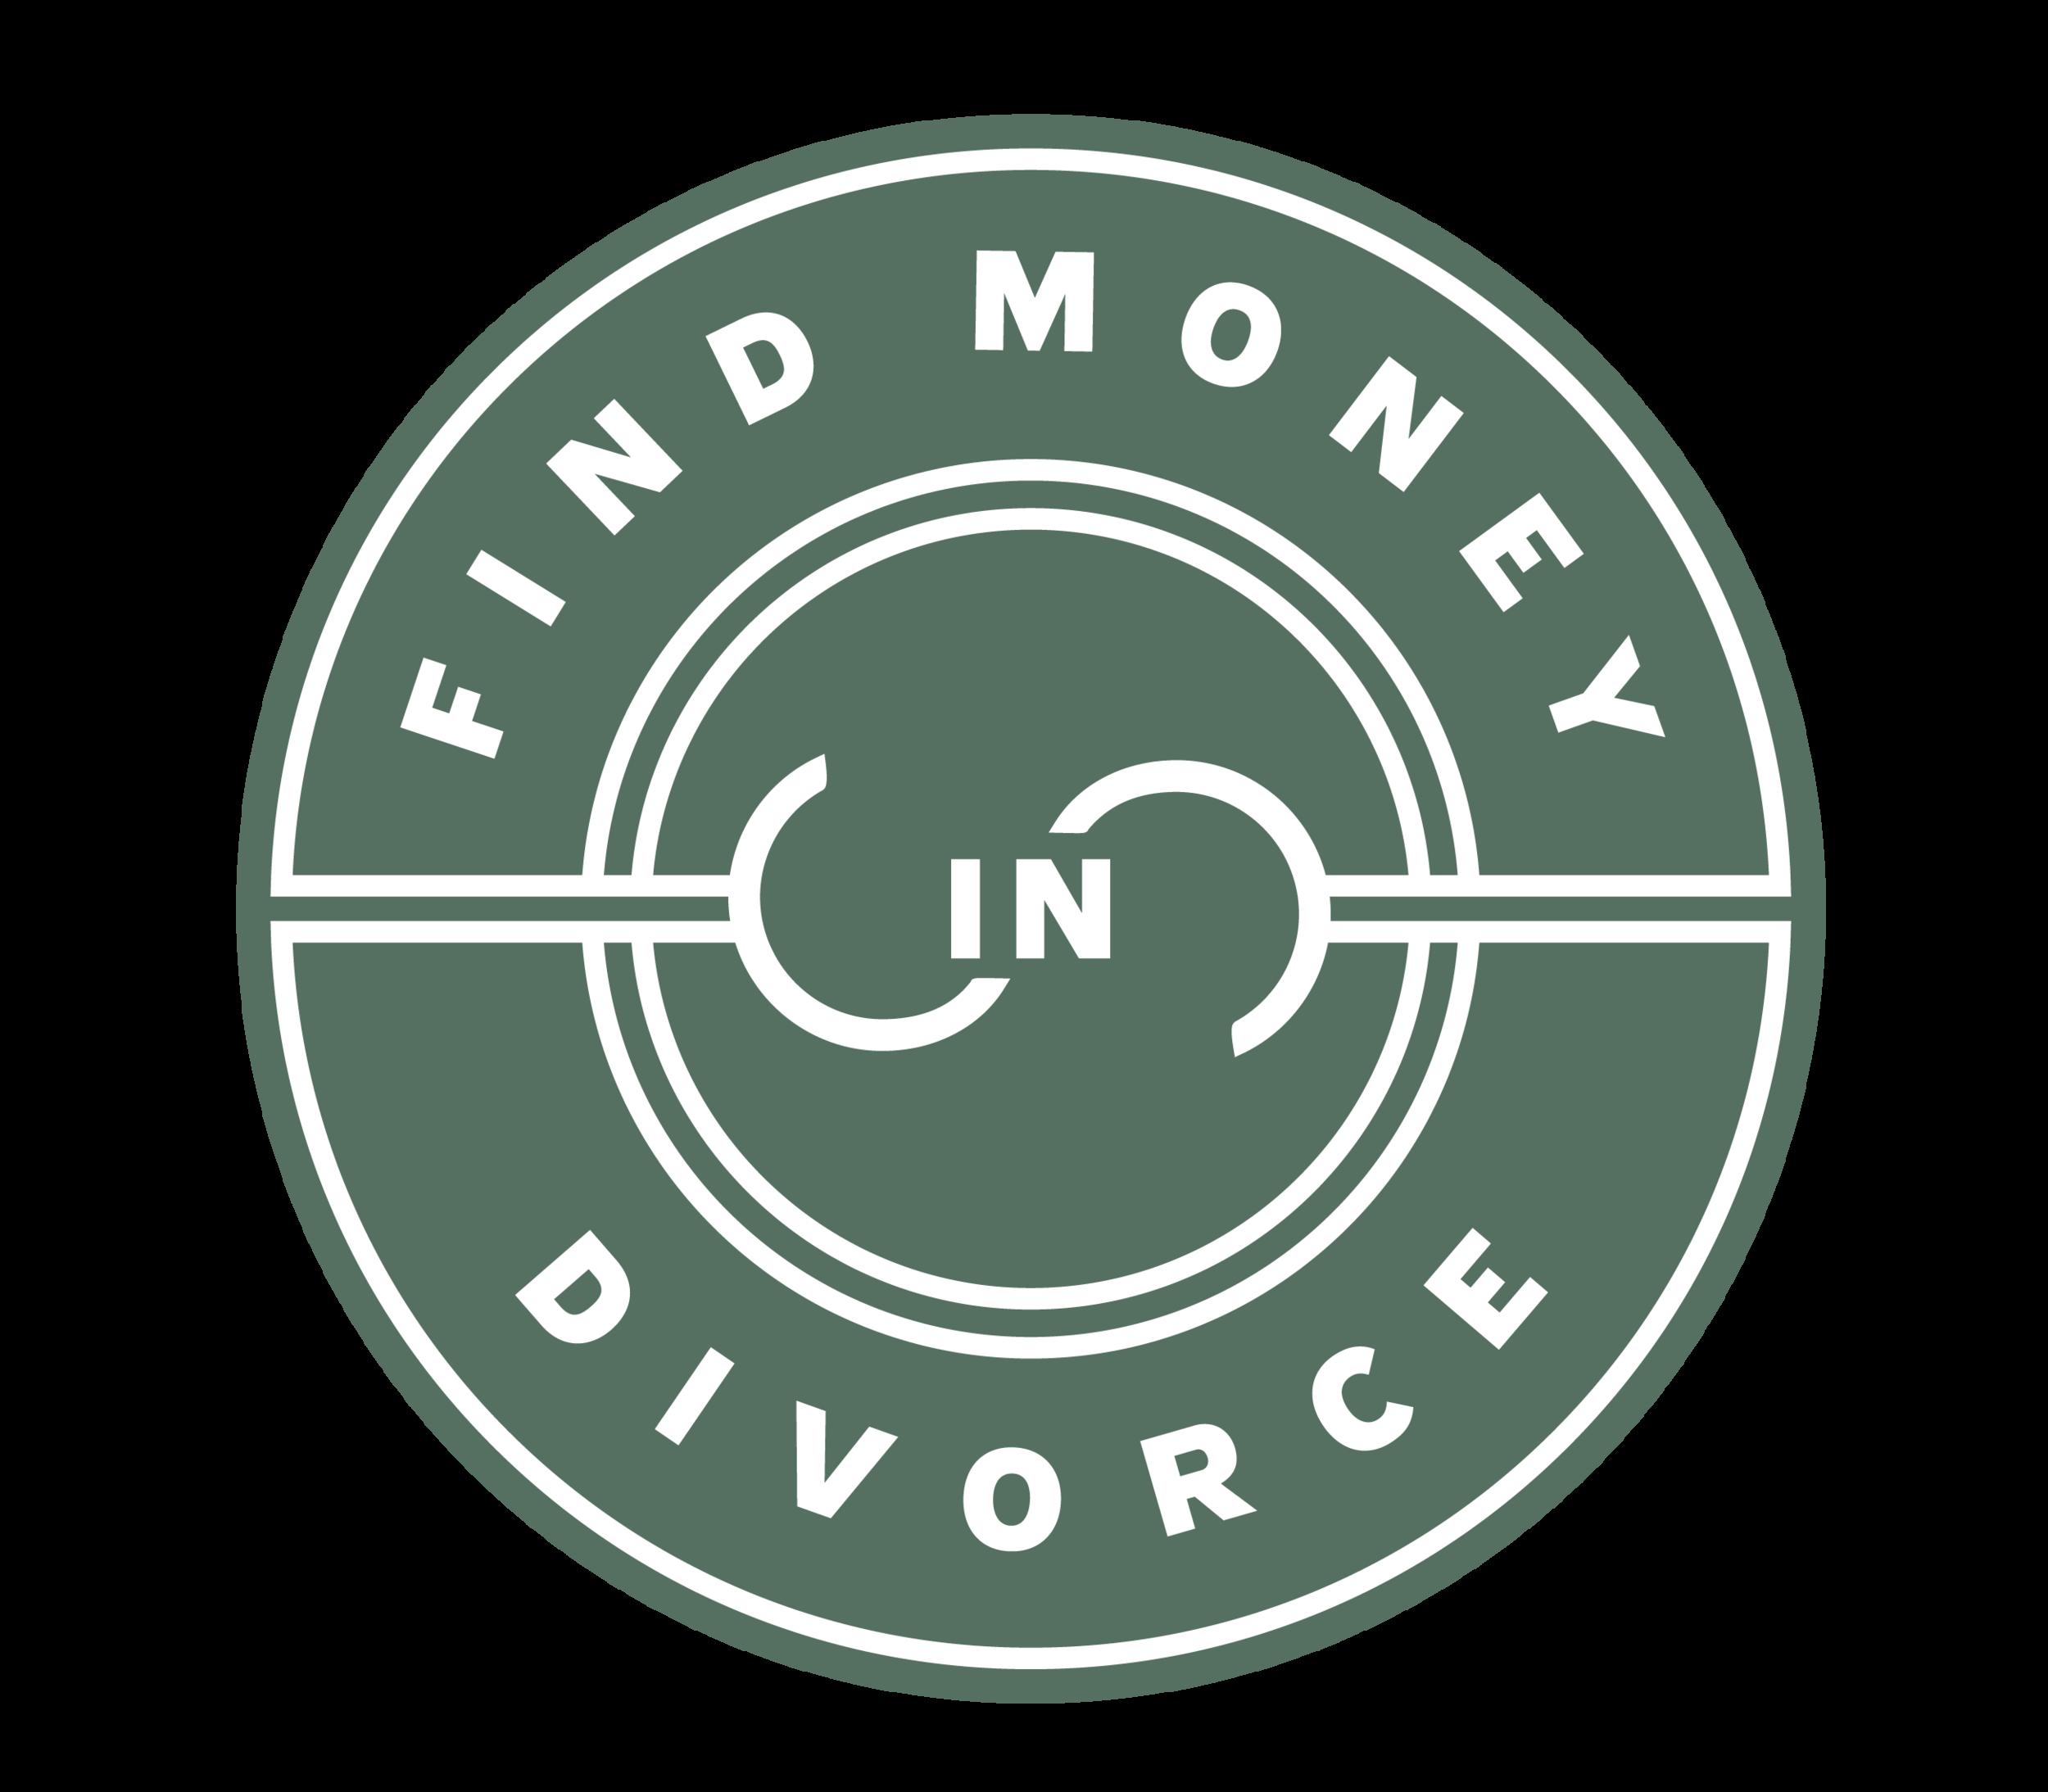 FMID_logo-02.png